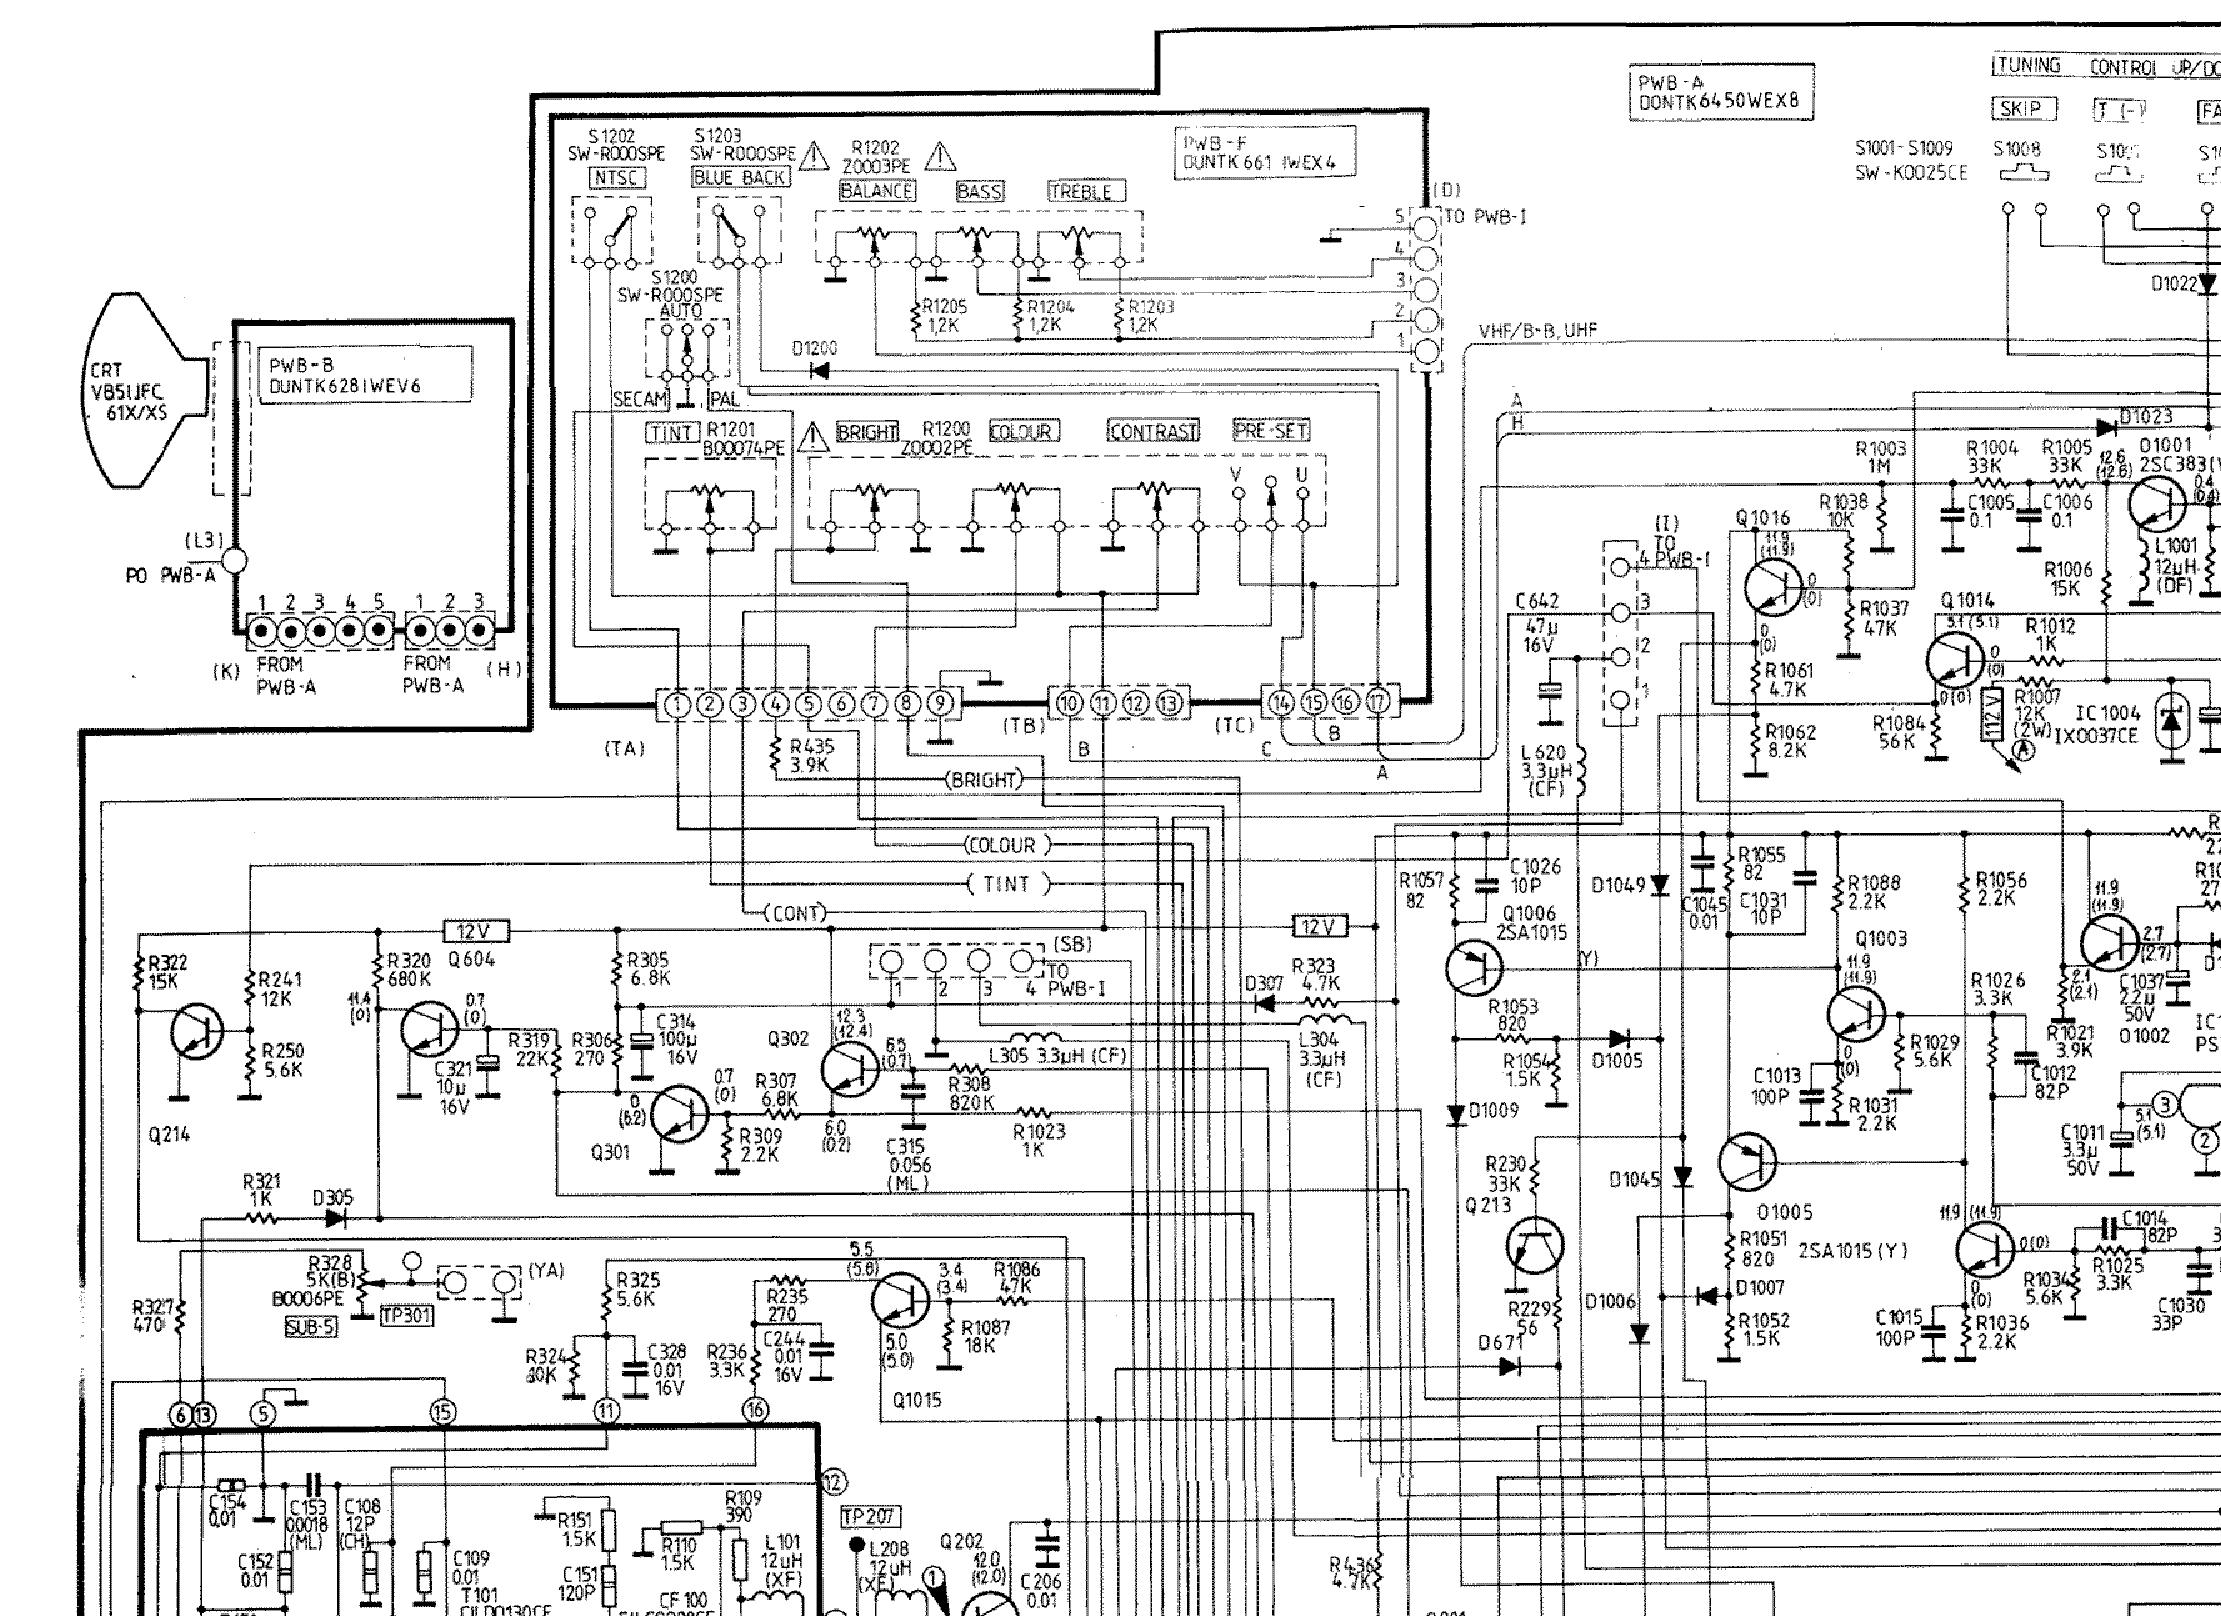 sharp sv 2142scn tv d service manual download  schematics  eeprom  repair info for electronics